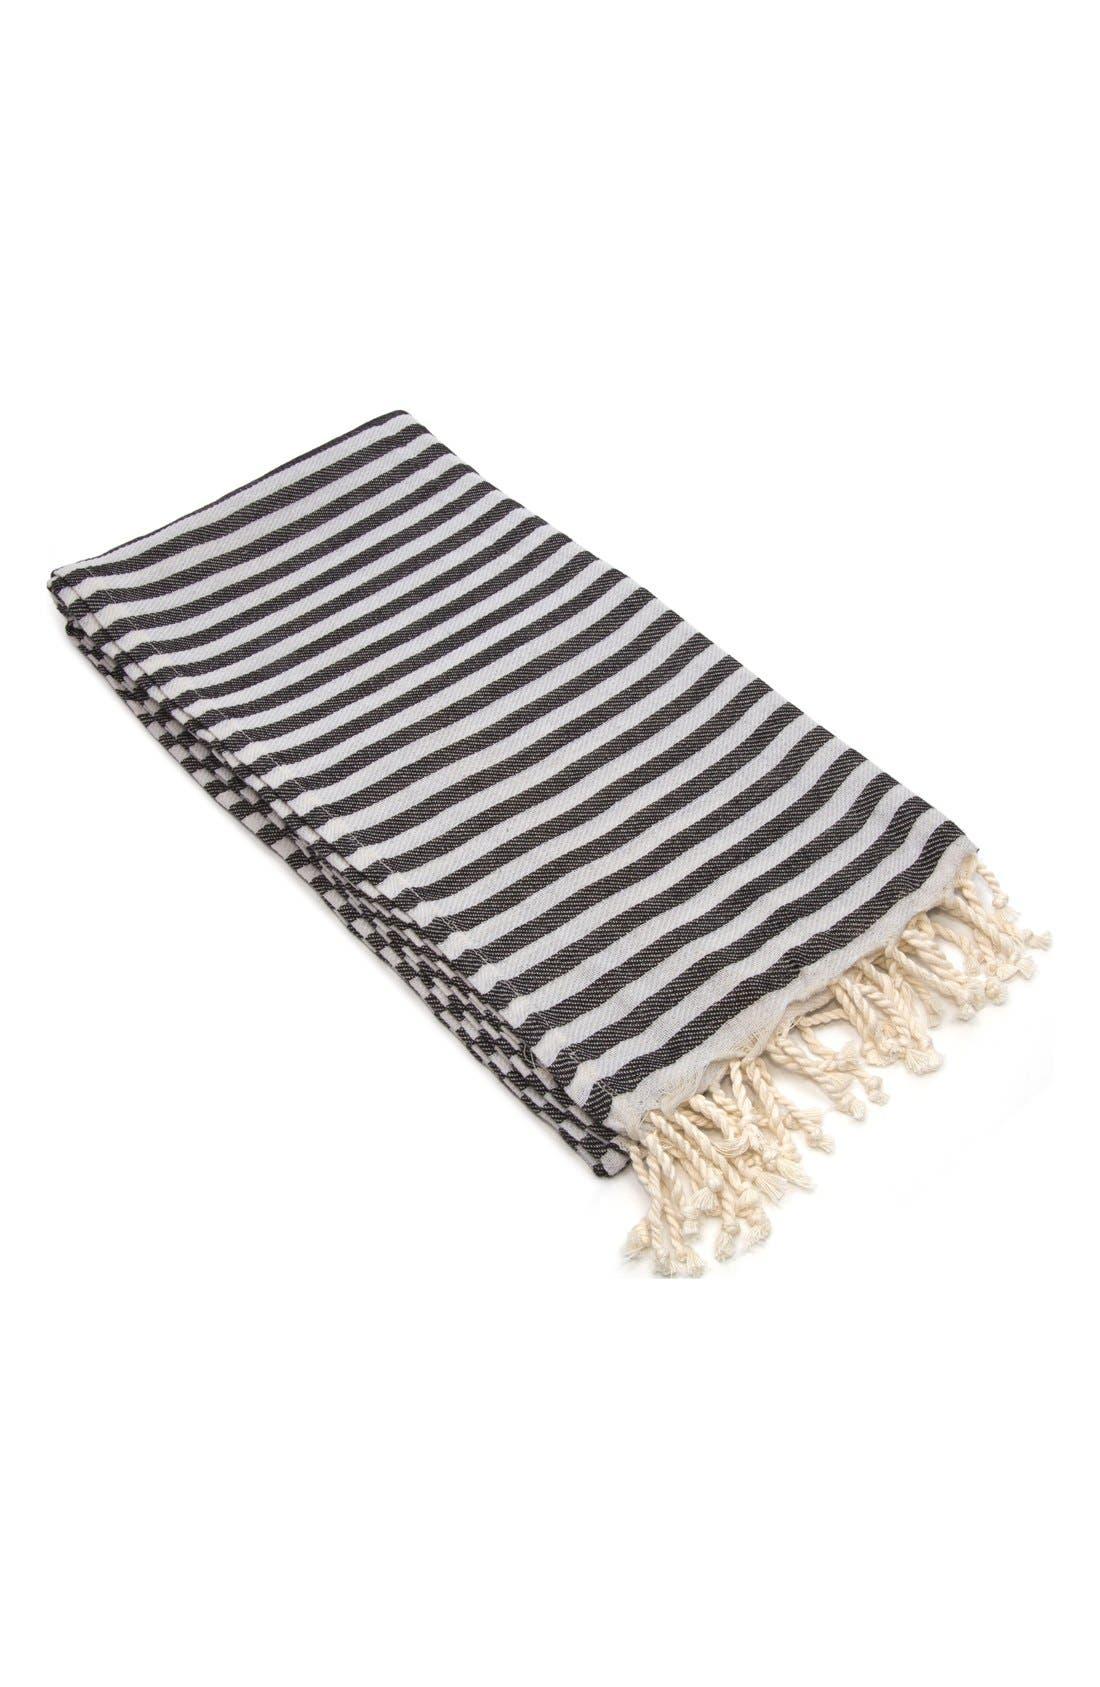 'Fun in the Sun' Turkish Pestemal Towel,                         Main,                         color, CHARCOAL BLACK